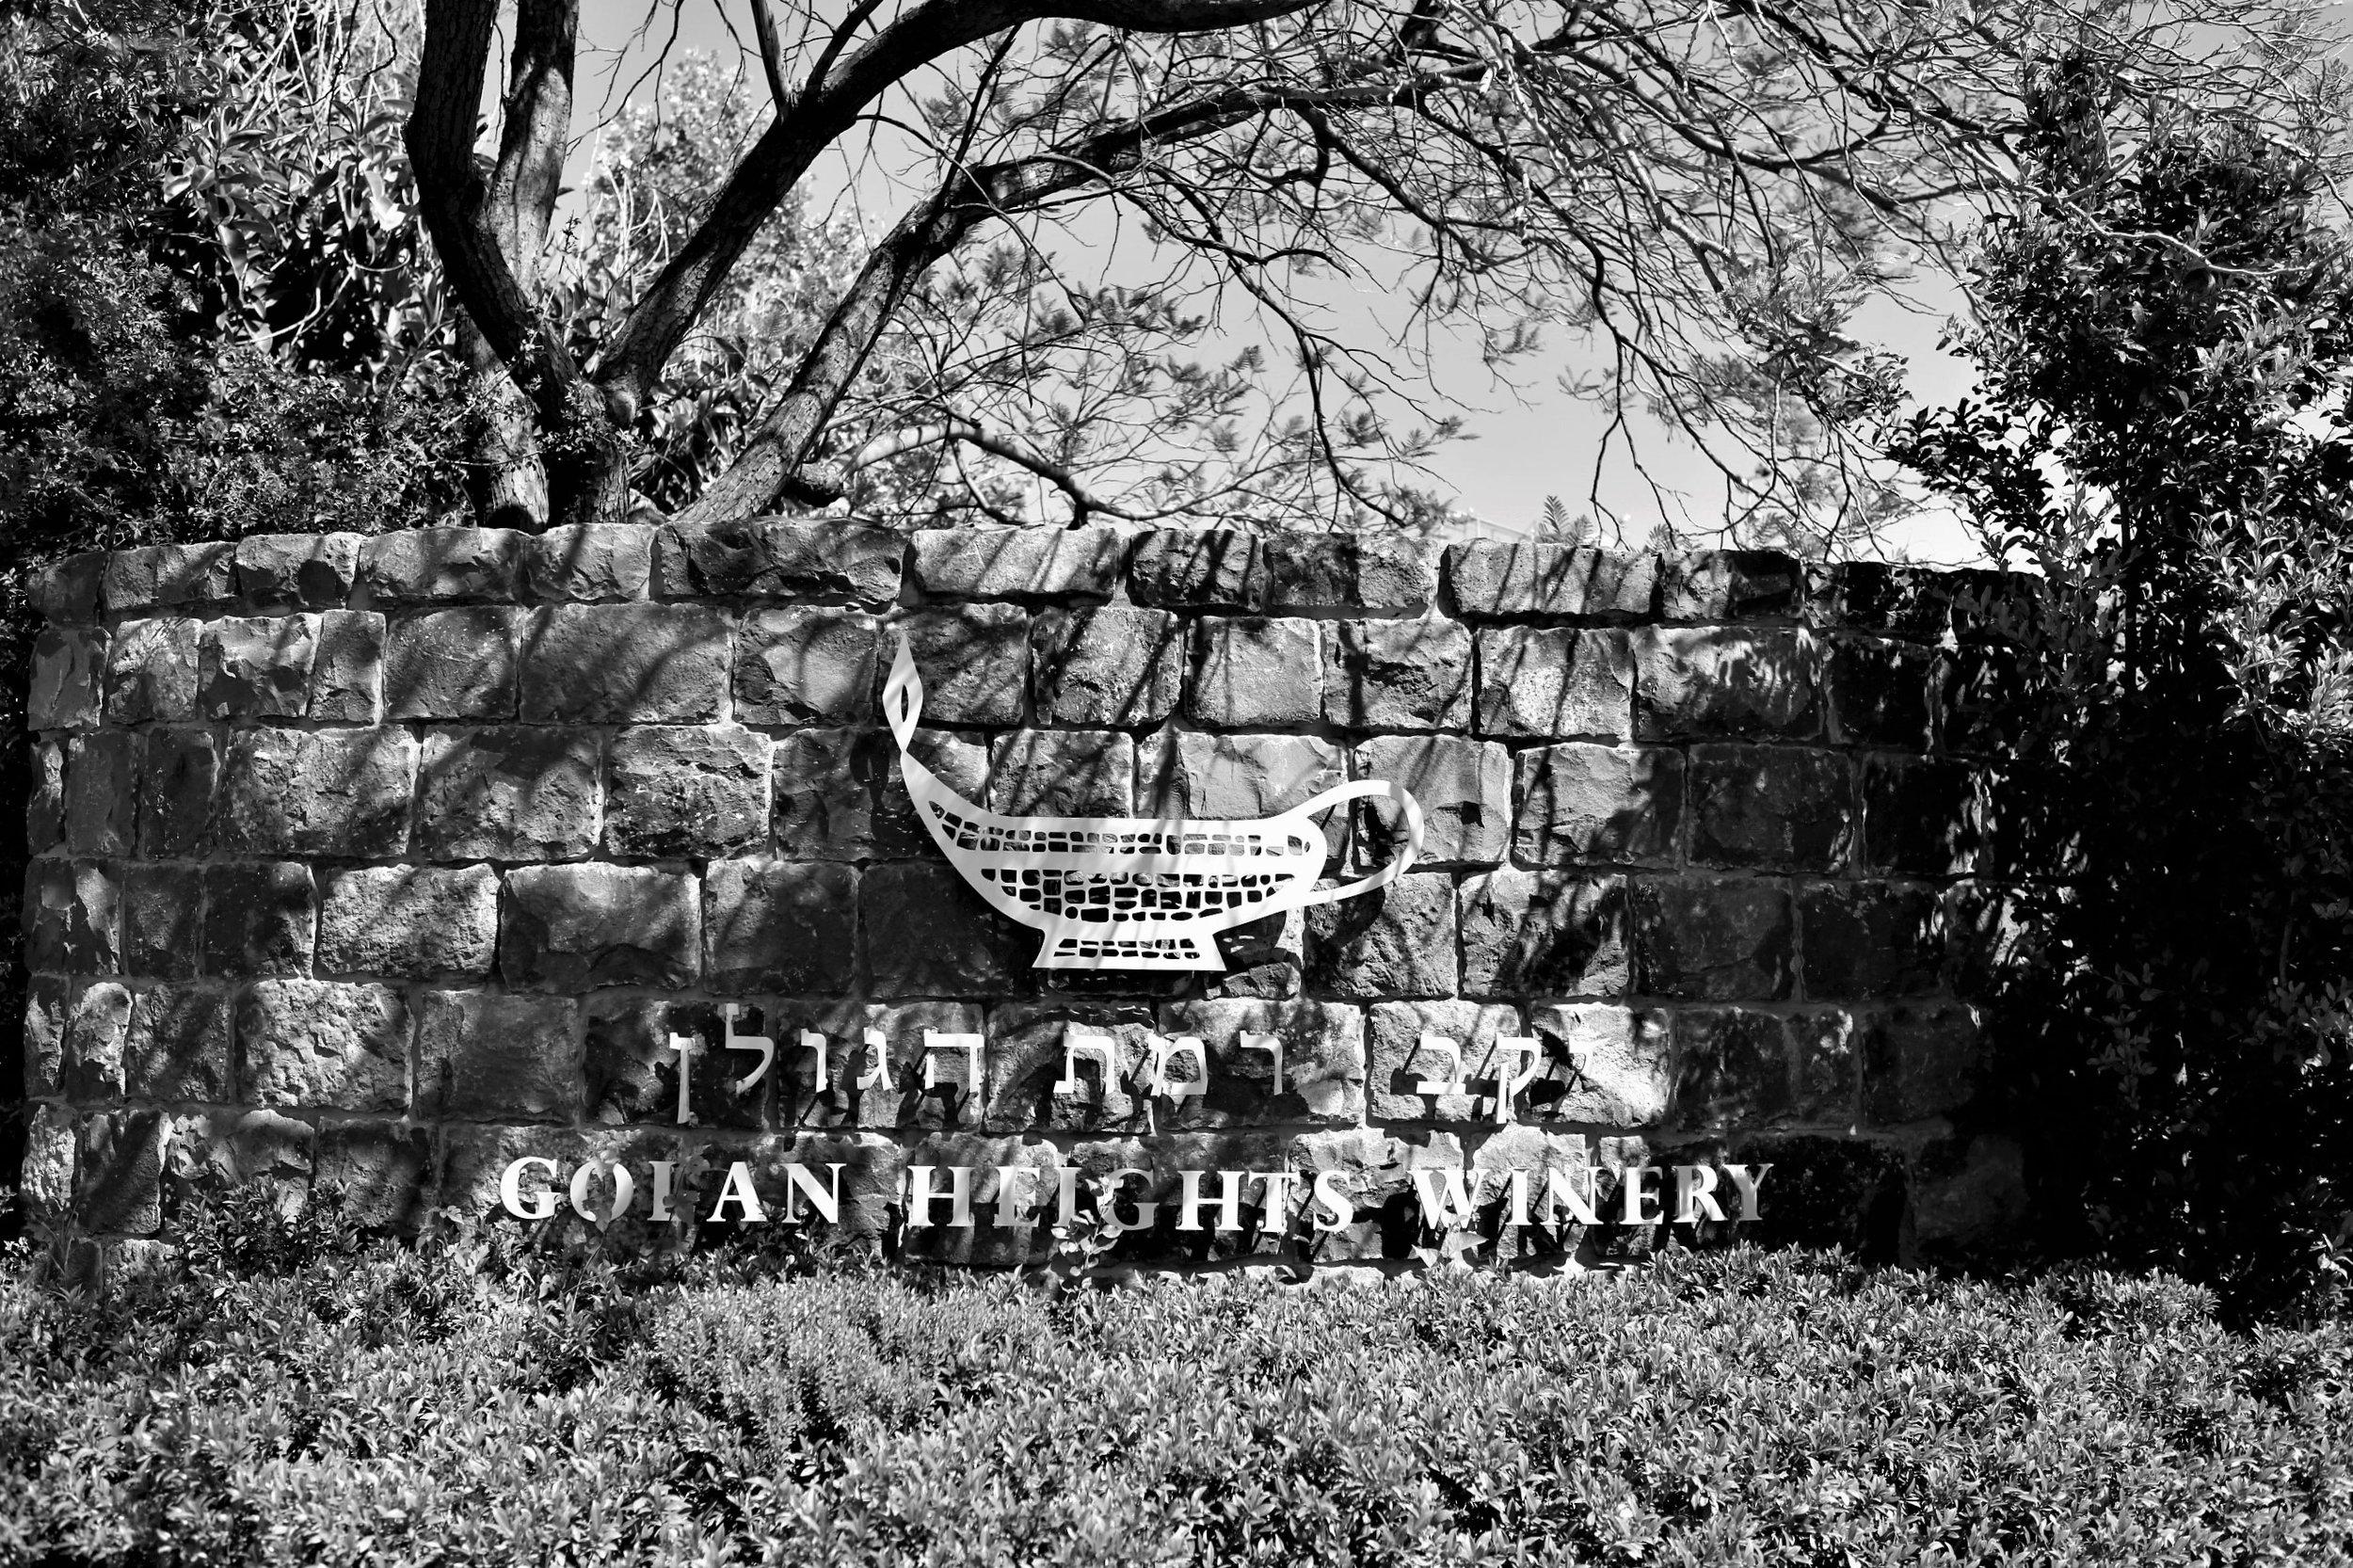 Golan Heights Winery, Qatsrin, Golanhöhen.